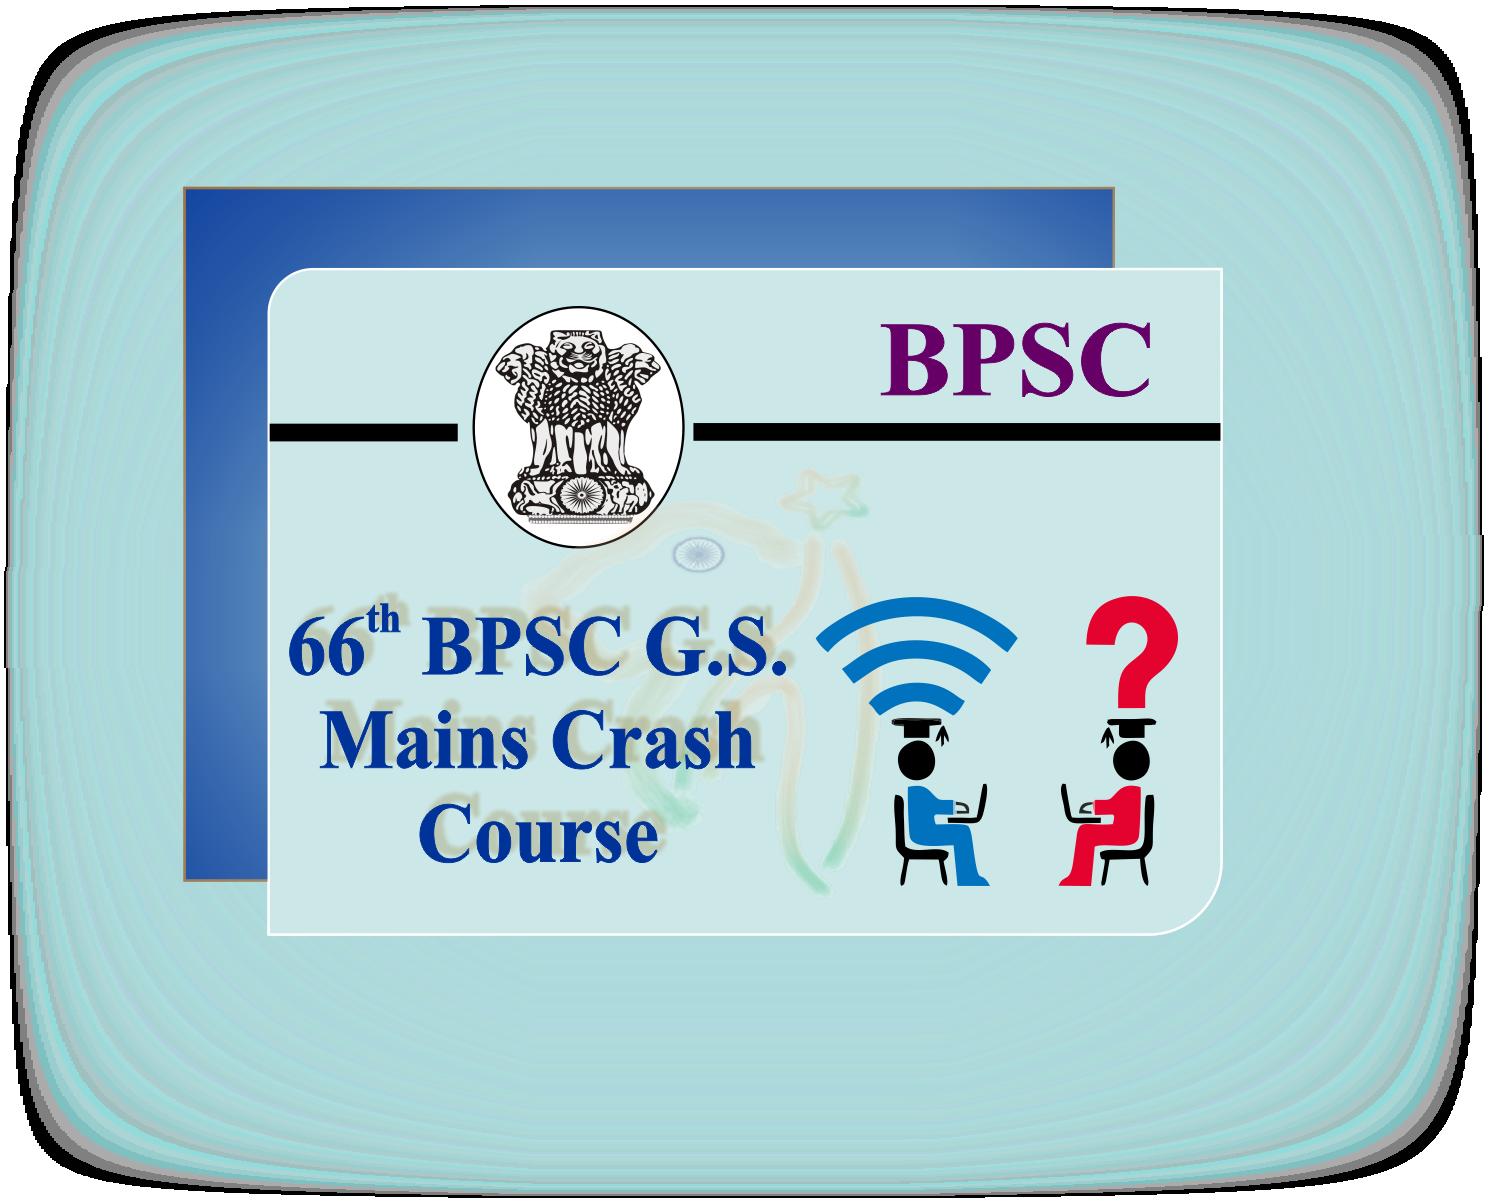 BPSC GS Mains Crash Course